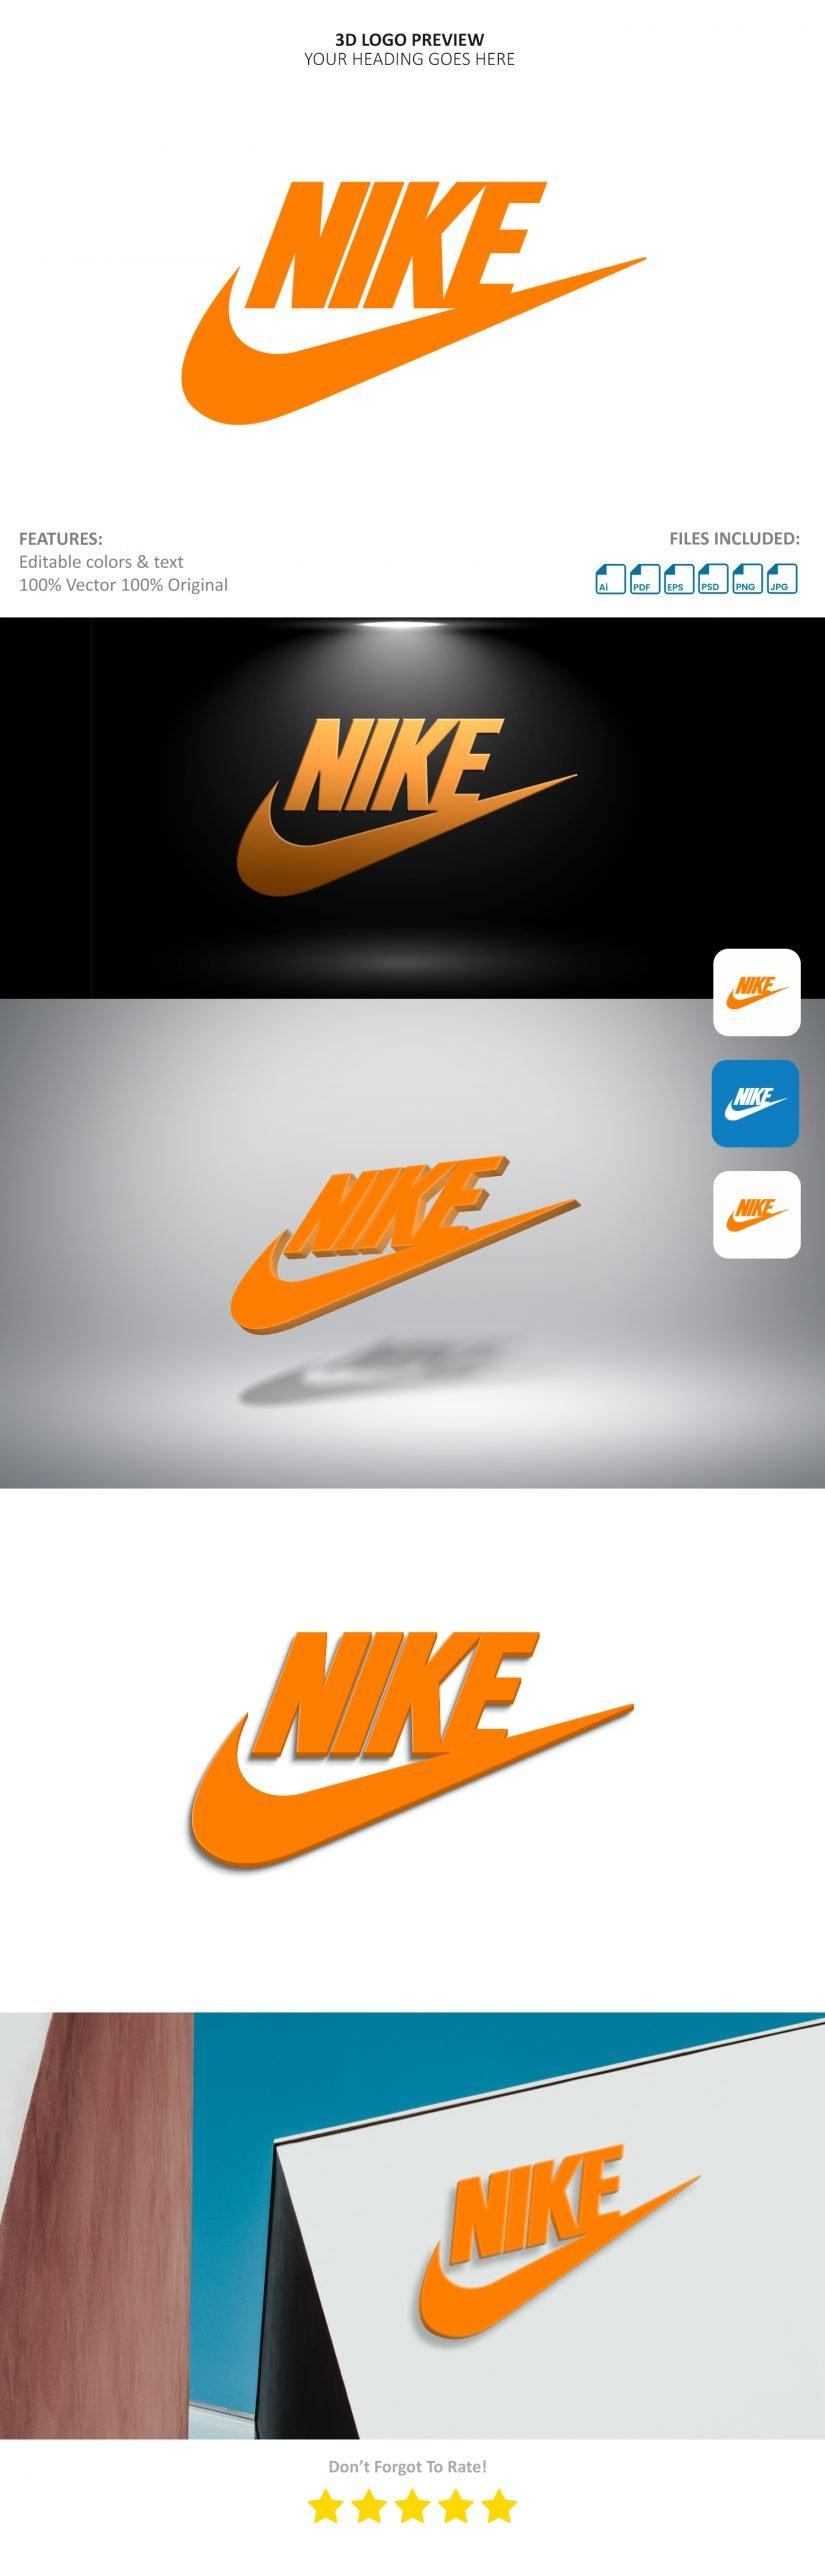 Nike 3D Logo Preview Mockup